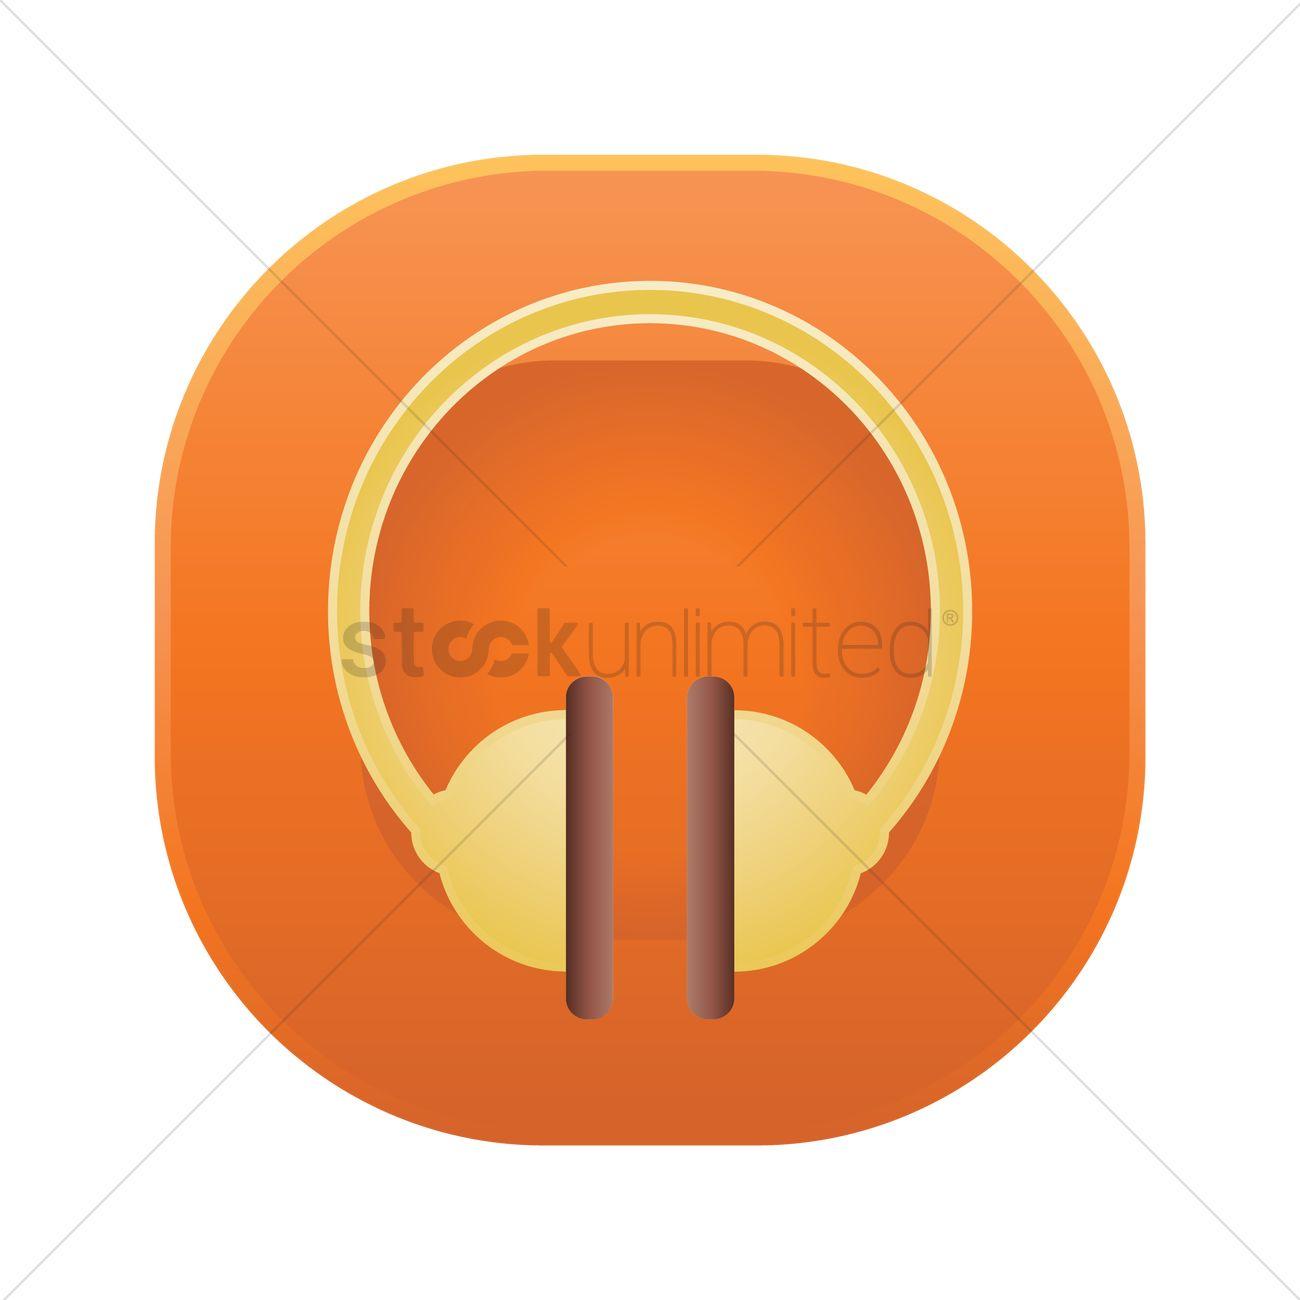 Headphones button Vector Image - 2032919 | StockUnlimited